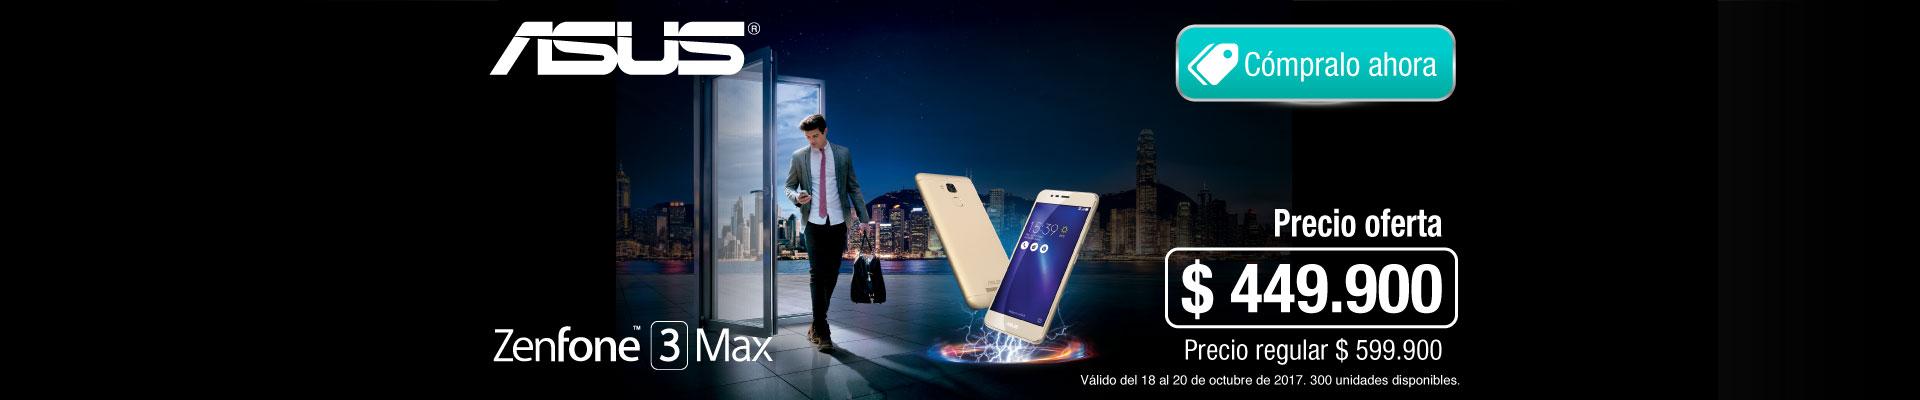 PPAL KT8-celulares-asuszenfone3max-prod-octubre18-20